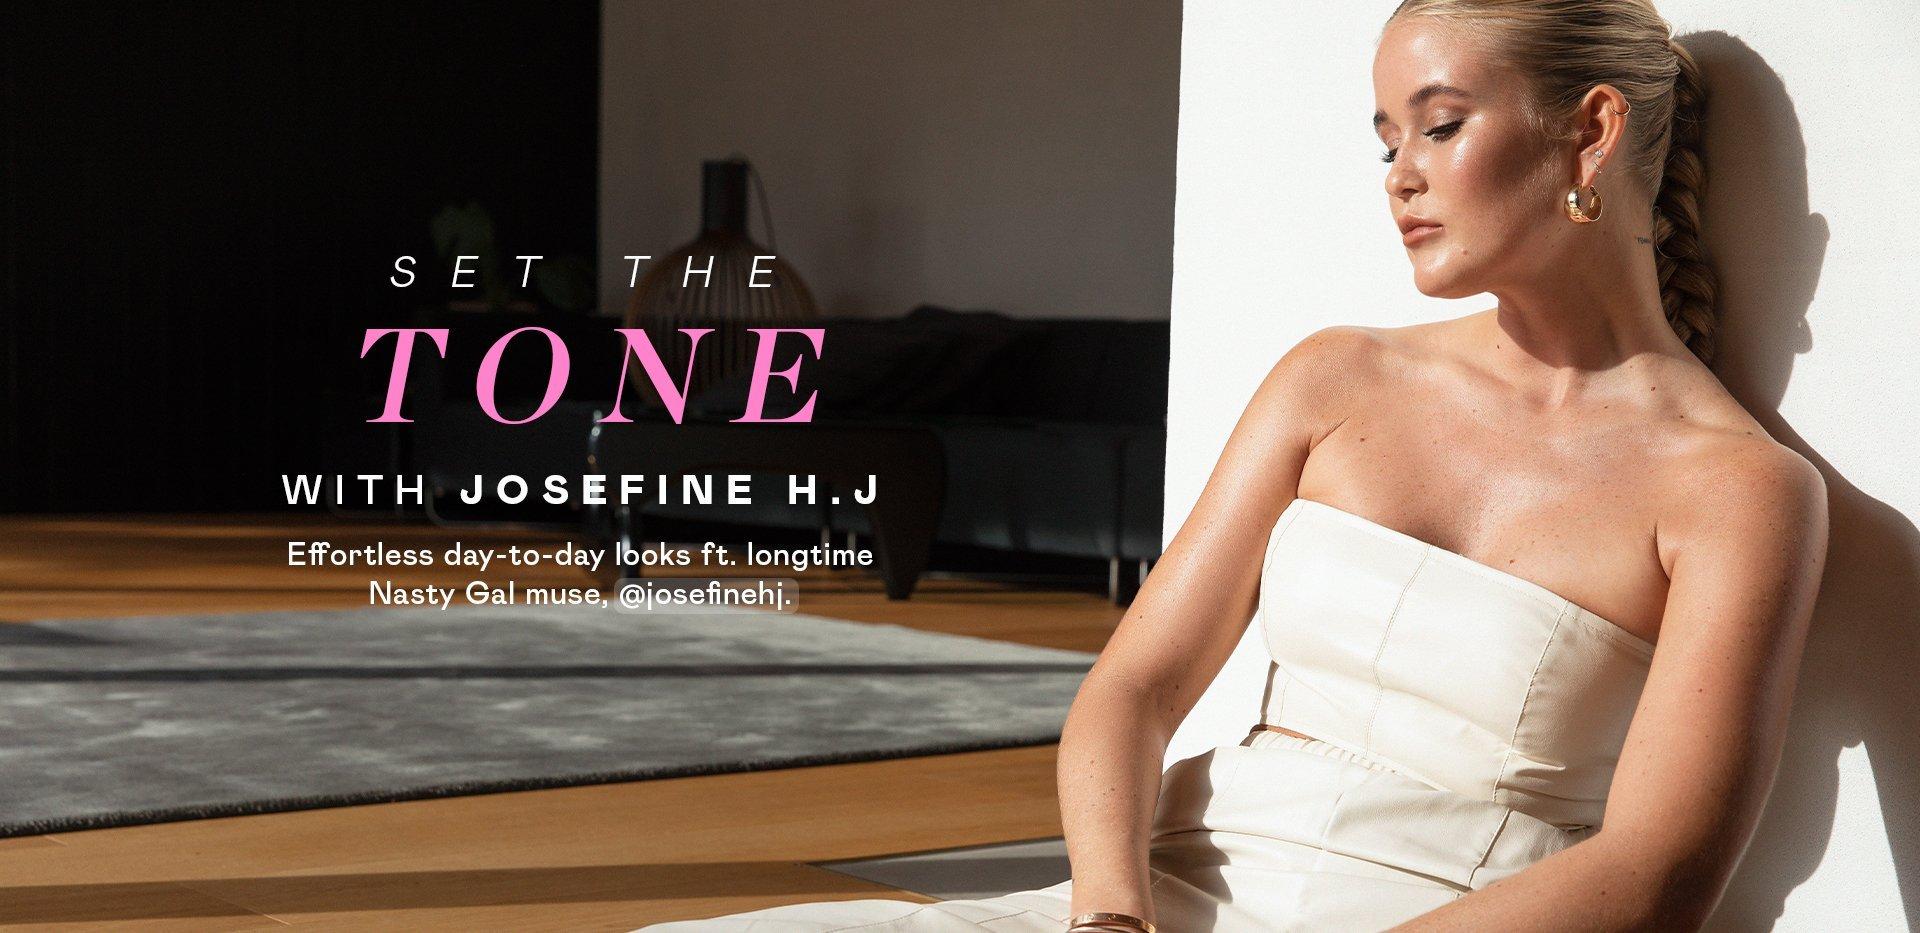 Set the Tone with Josefine H.J